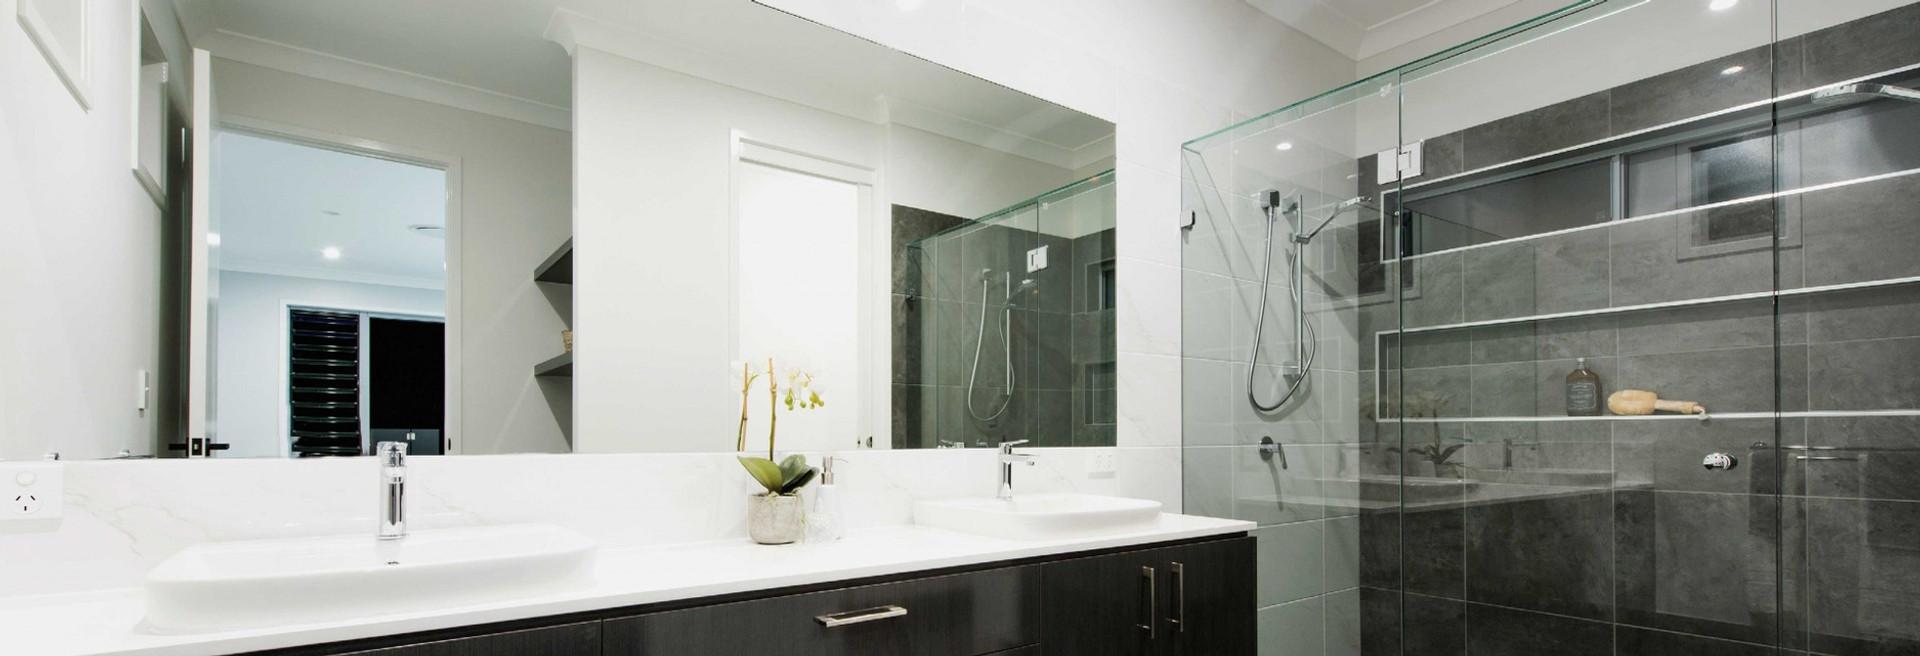 Large-Frameless-Mirror-in-a-bathroom-102